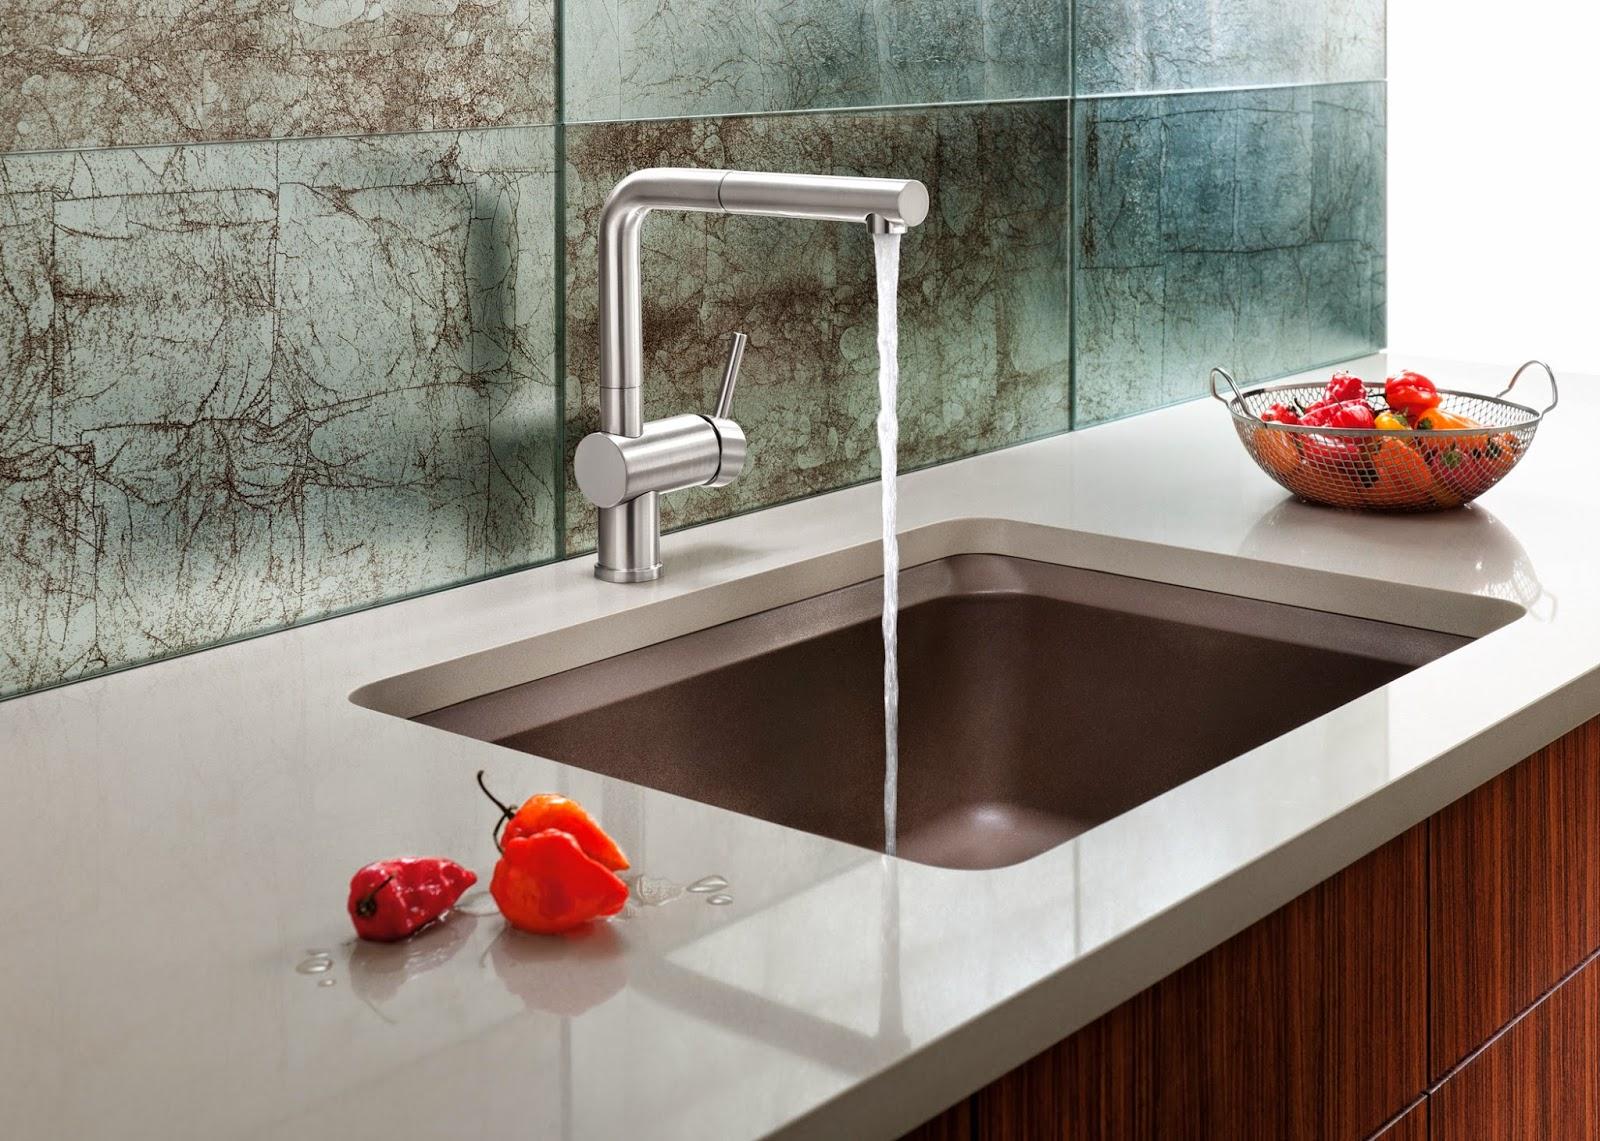 The white apron newport beach - Newport Beach Kitchen Designer Pulls The Faucet